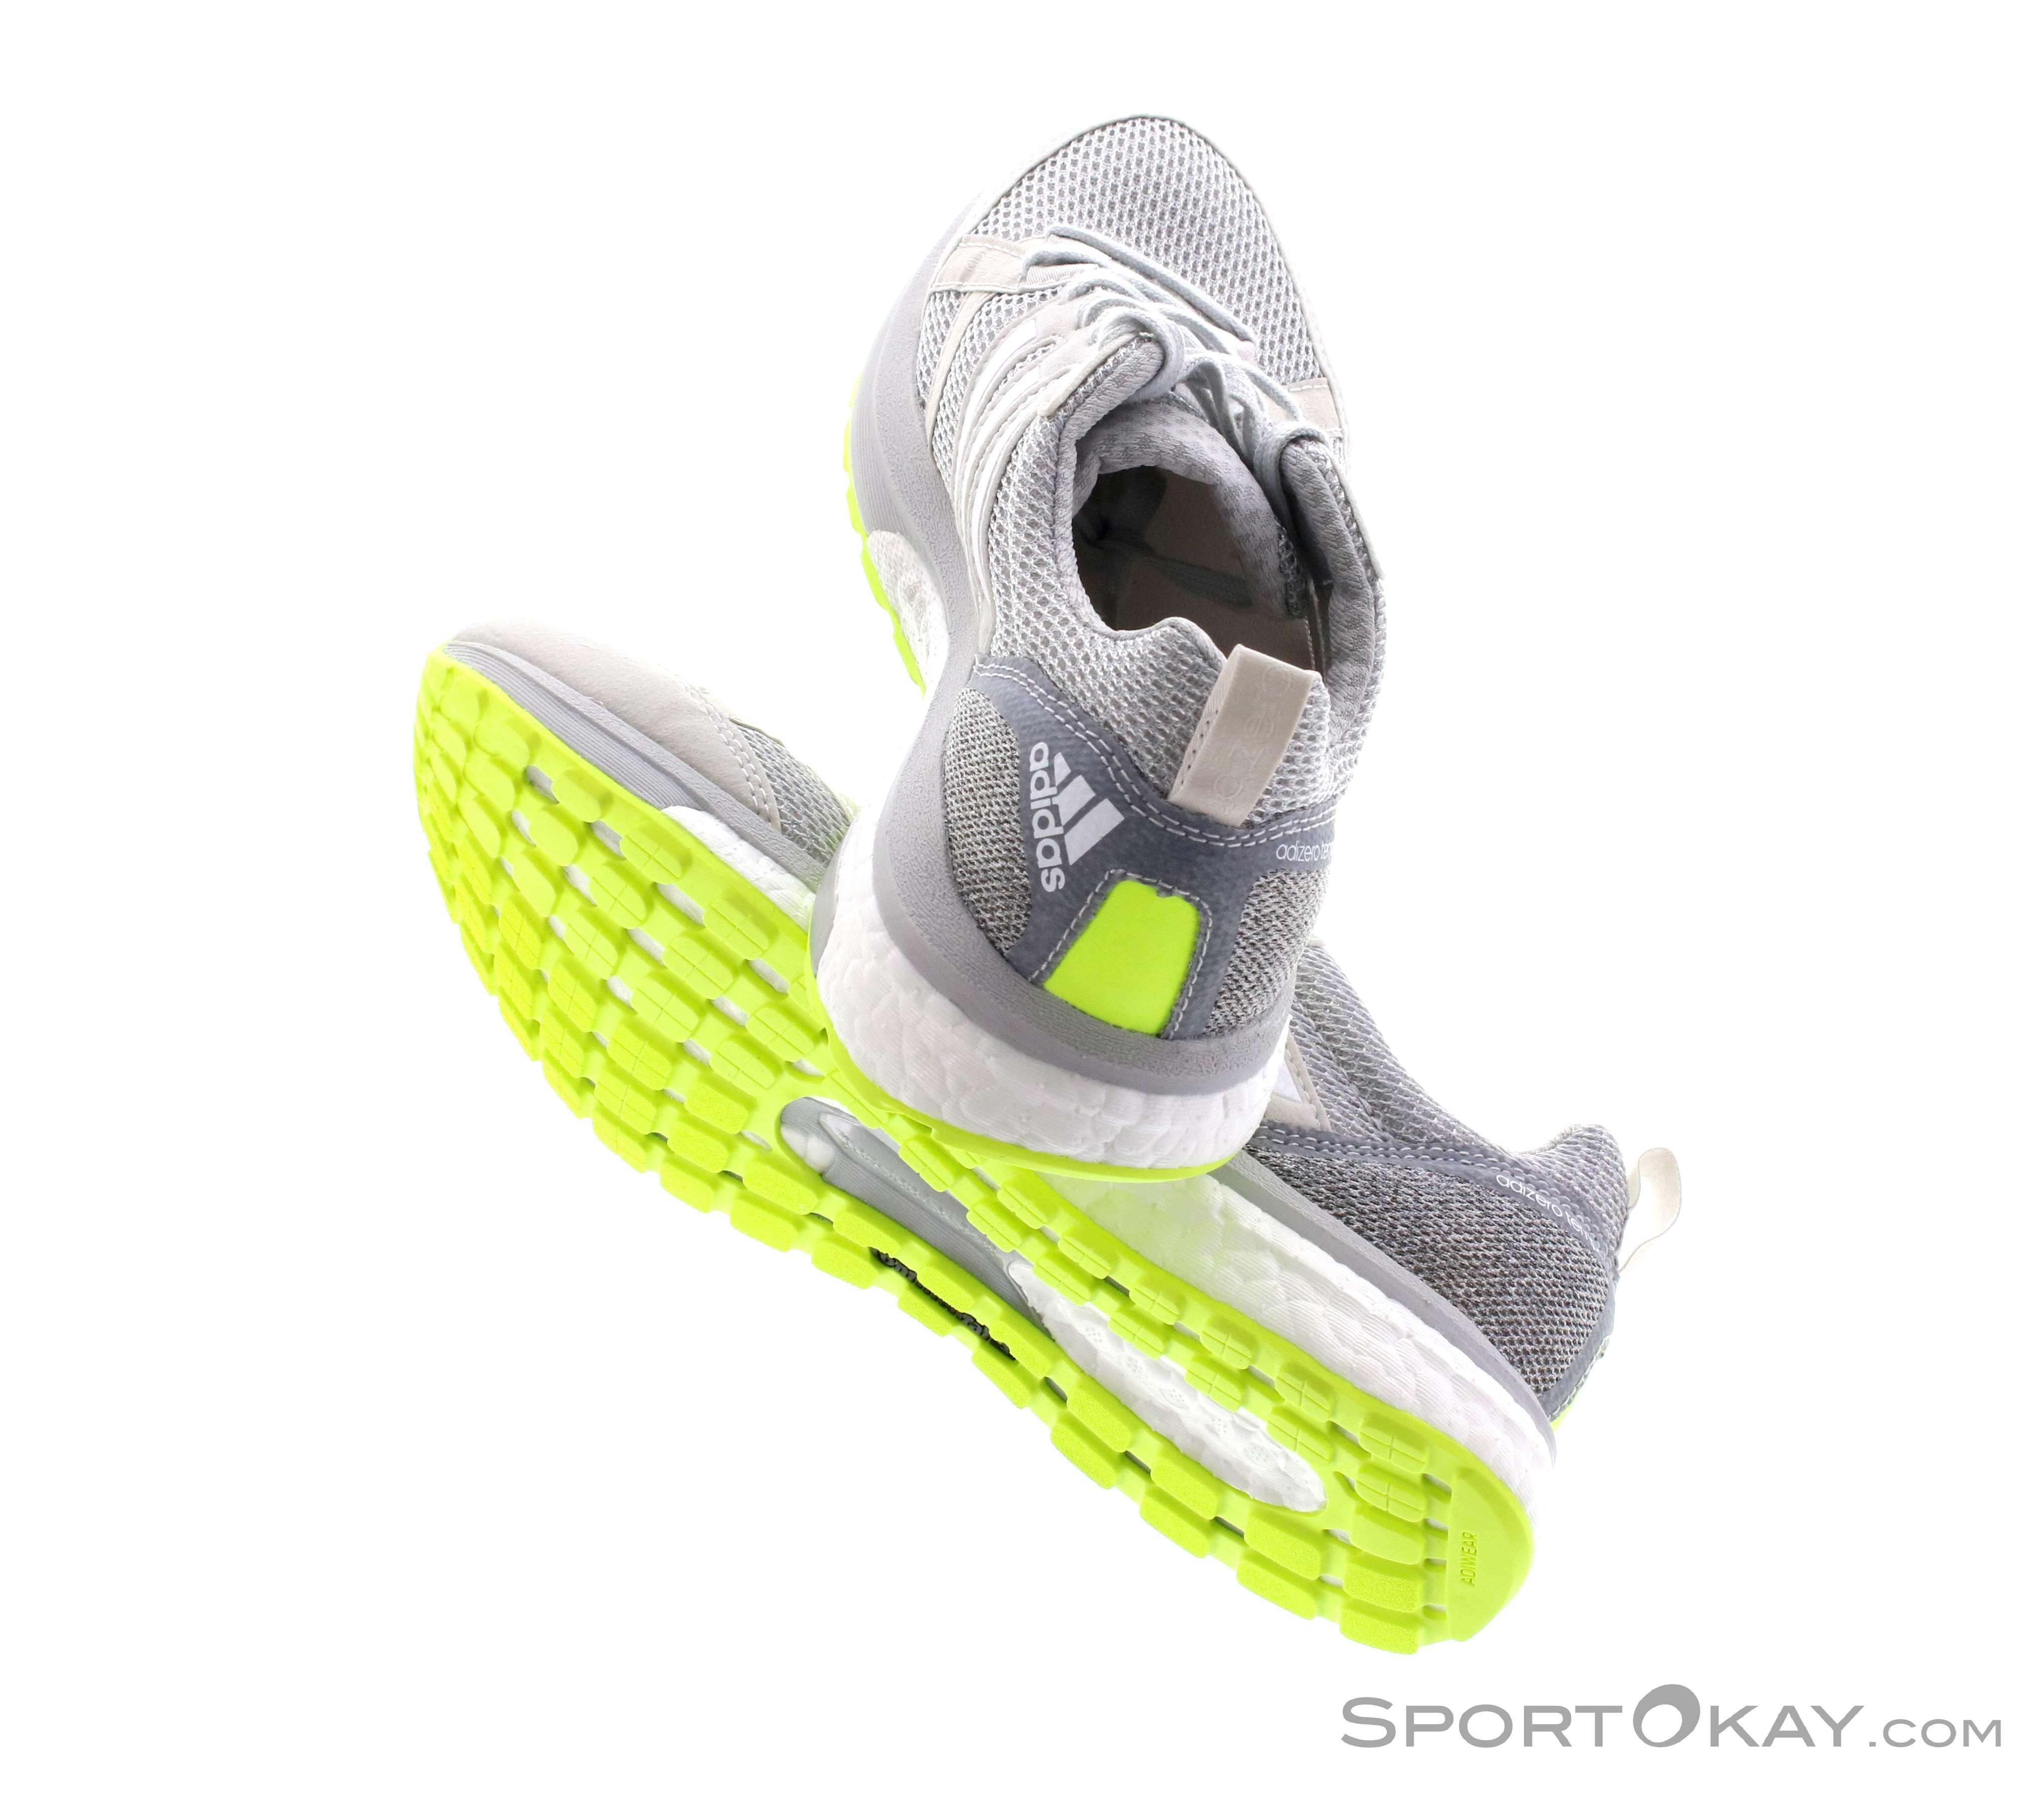 premium selection 38bfe 8f575 adidas Adizero Tempo 8 Damen Laufschuhe, adidas, Grau, , Damen, 0002-